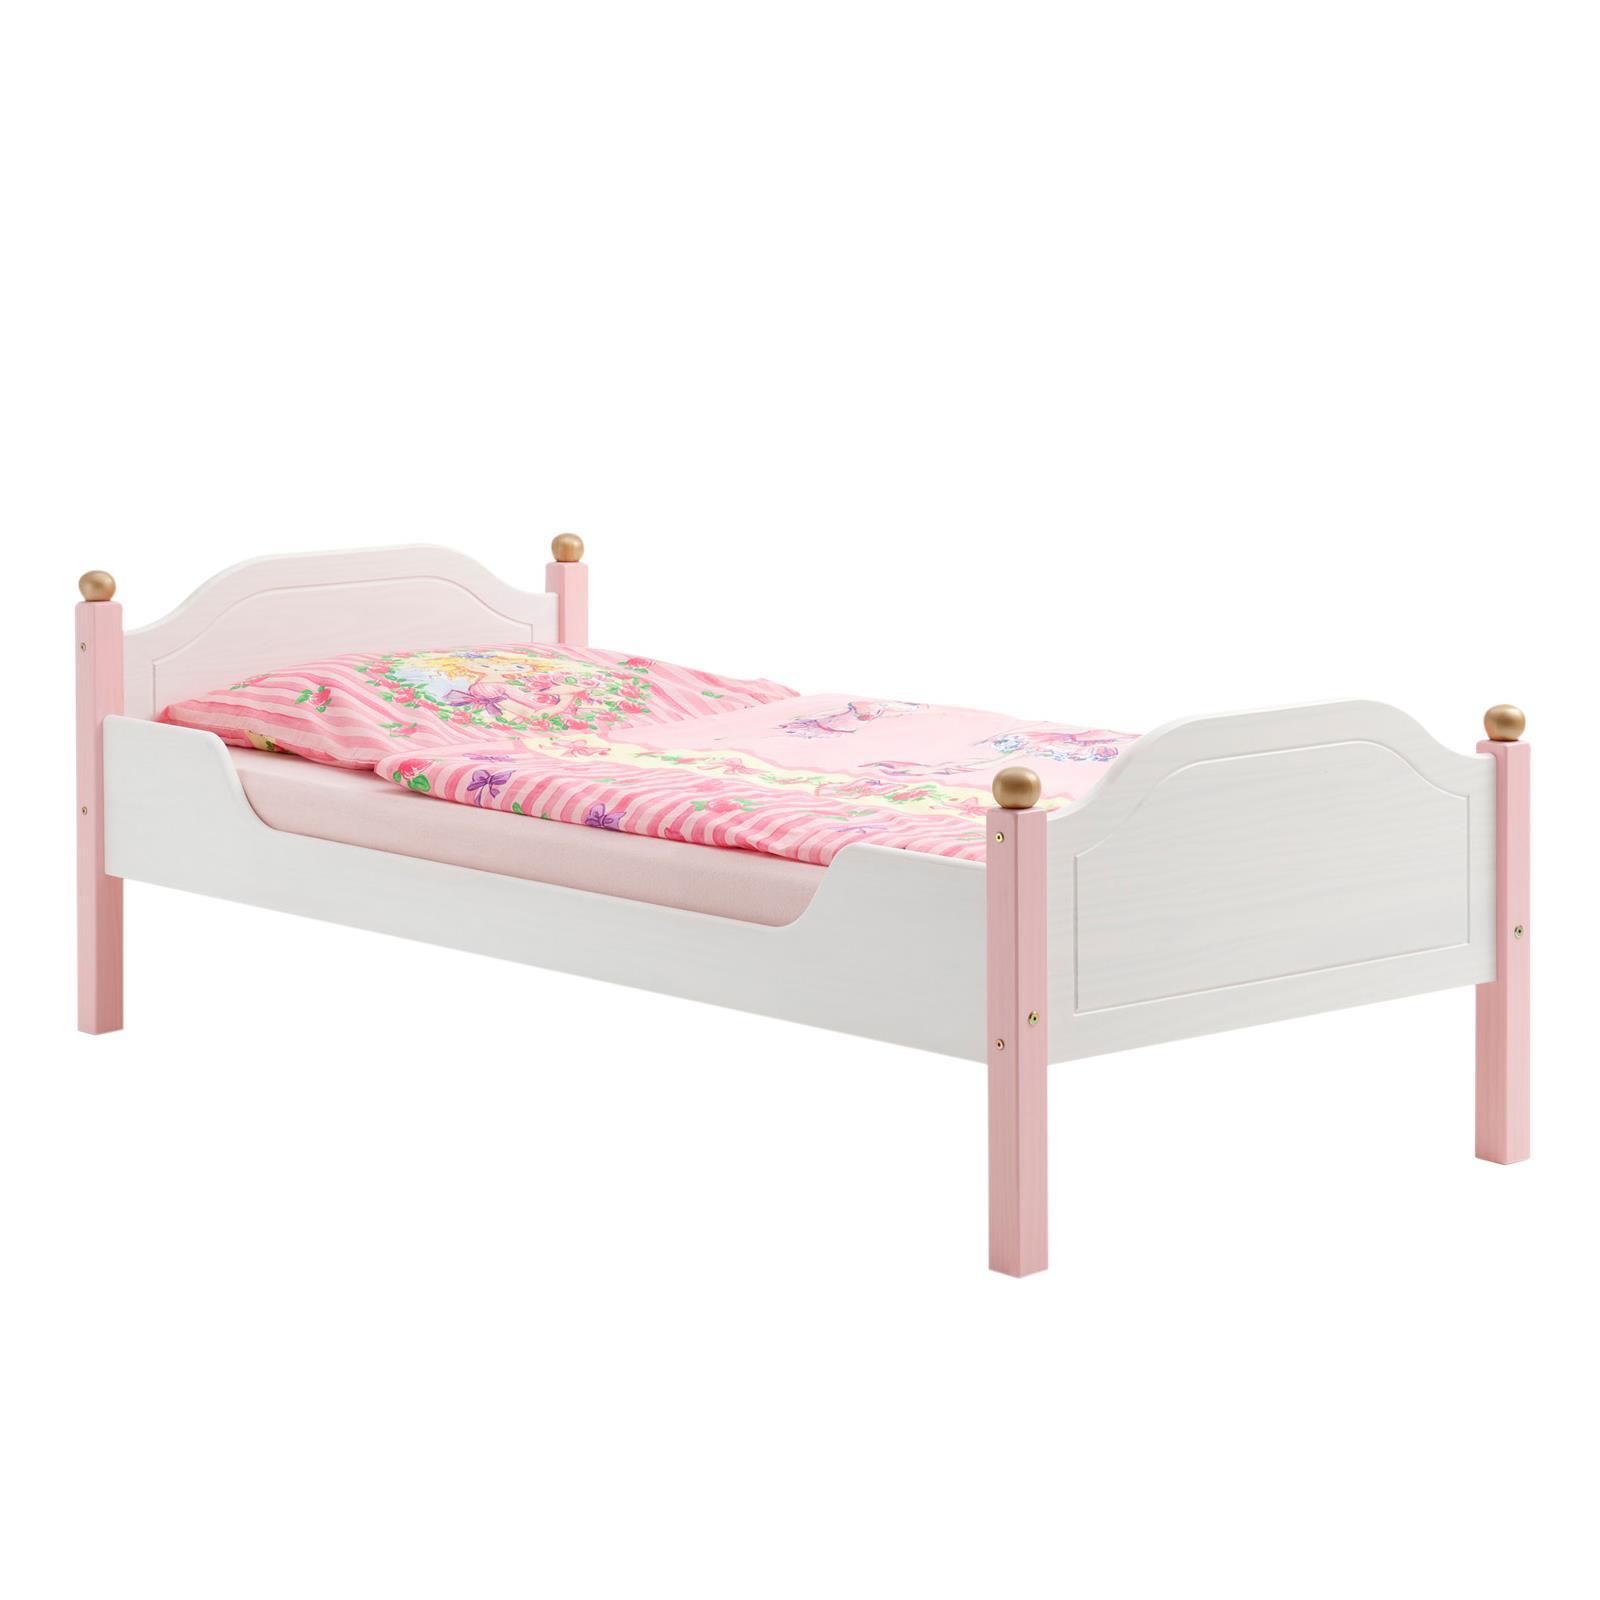 kinderbett isabella kiefer massiv wei rosa mobilia24. Black Bedroom Furniture Sets. Home Design Ideas